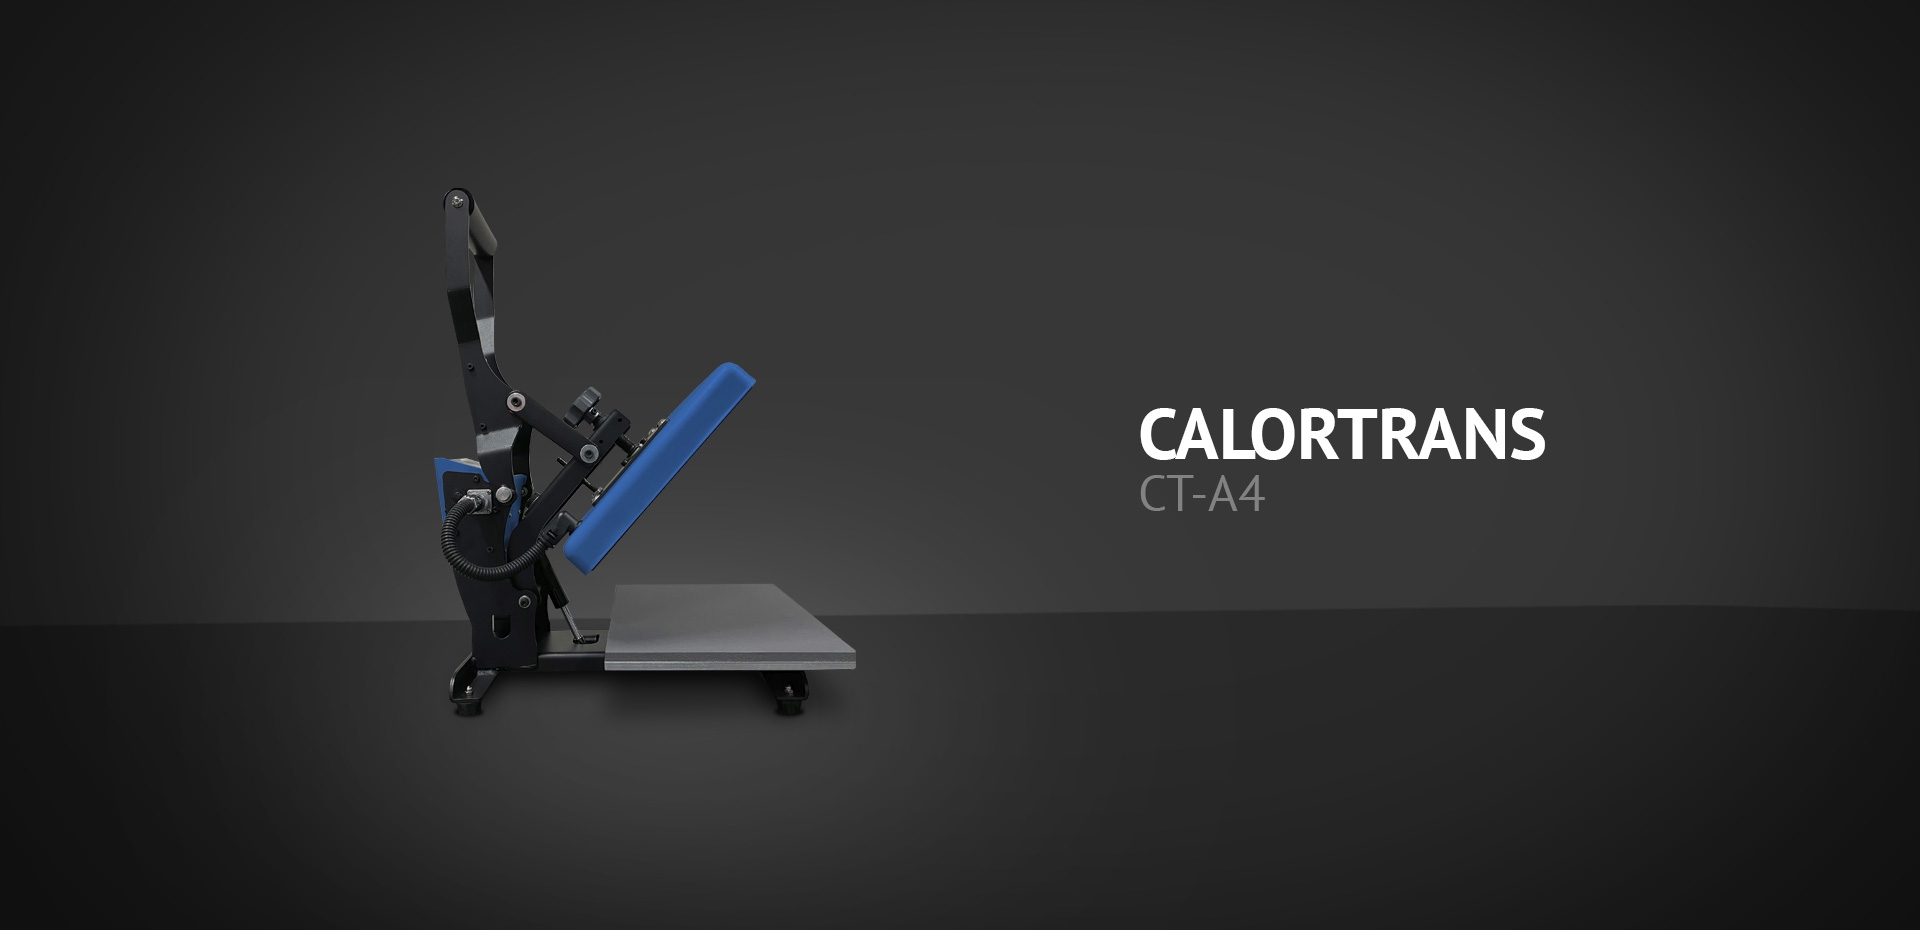 Calortrans-A4-banner